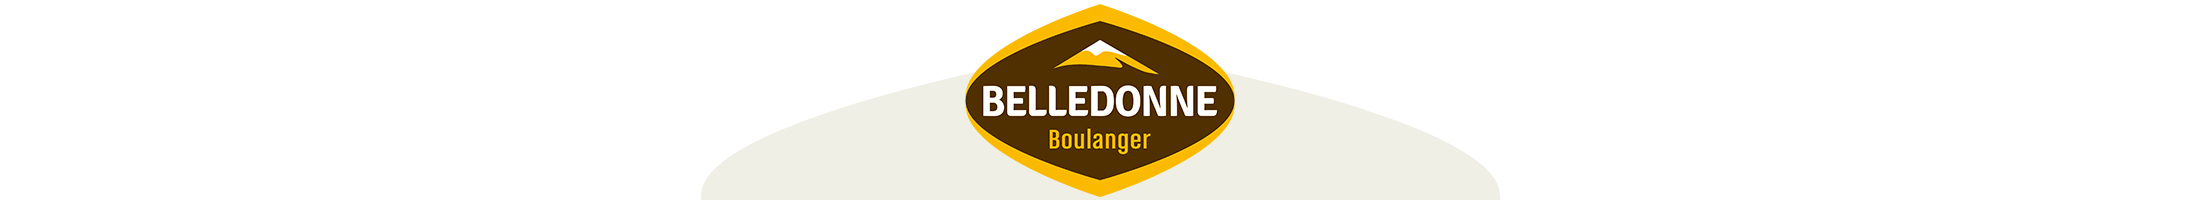 Logo Bandeau Intercalaire Boulangerie